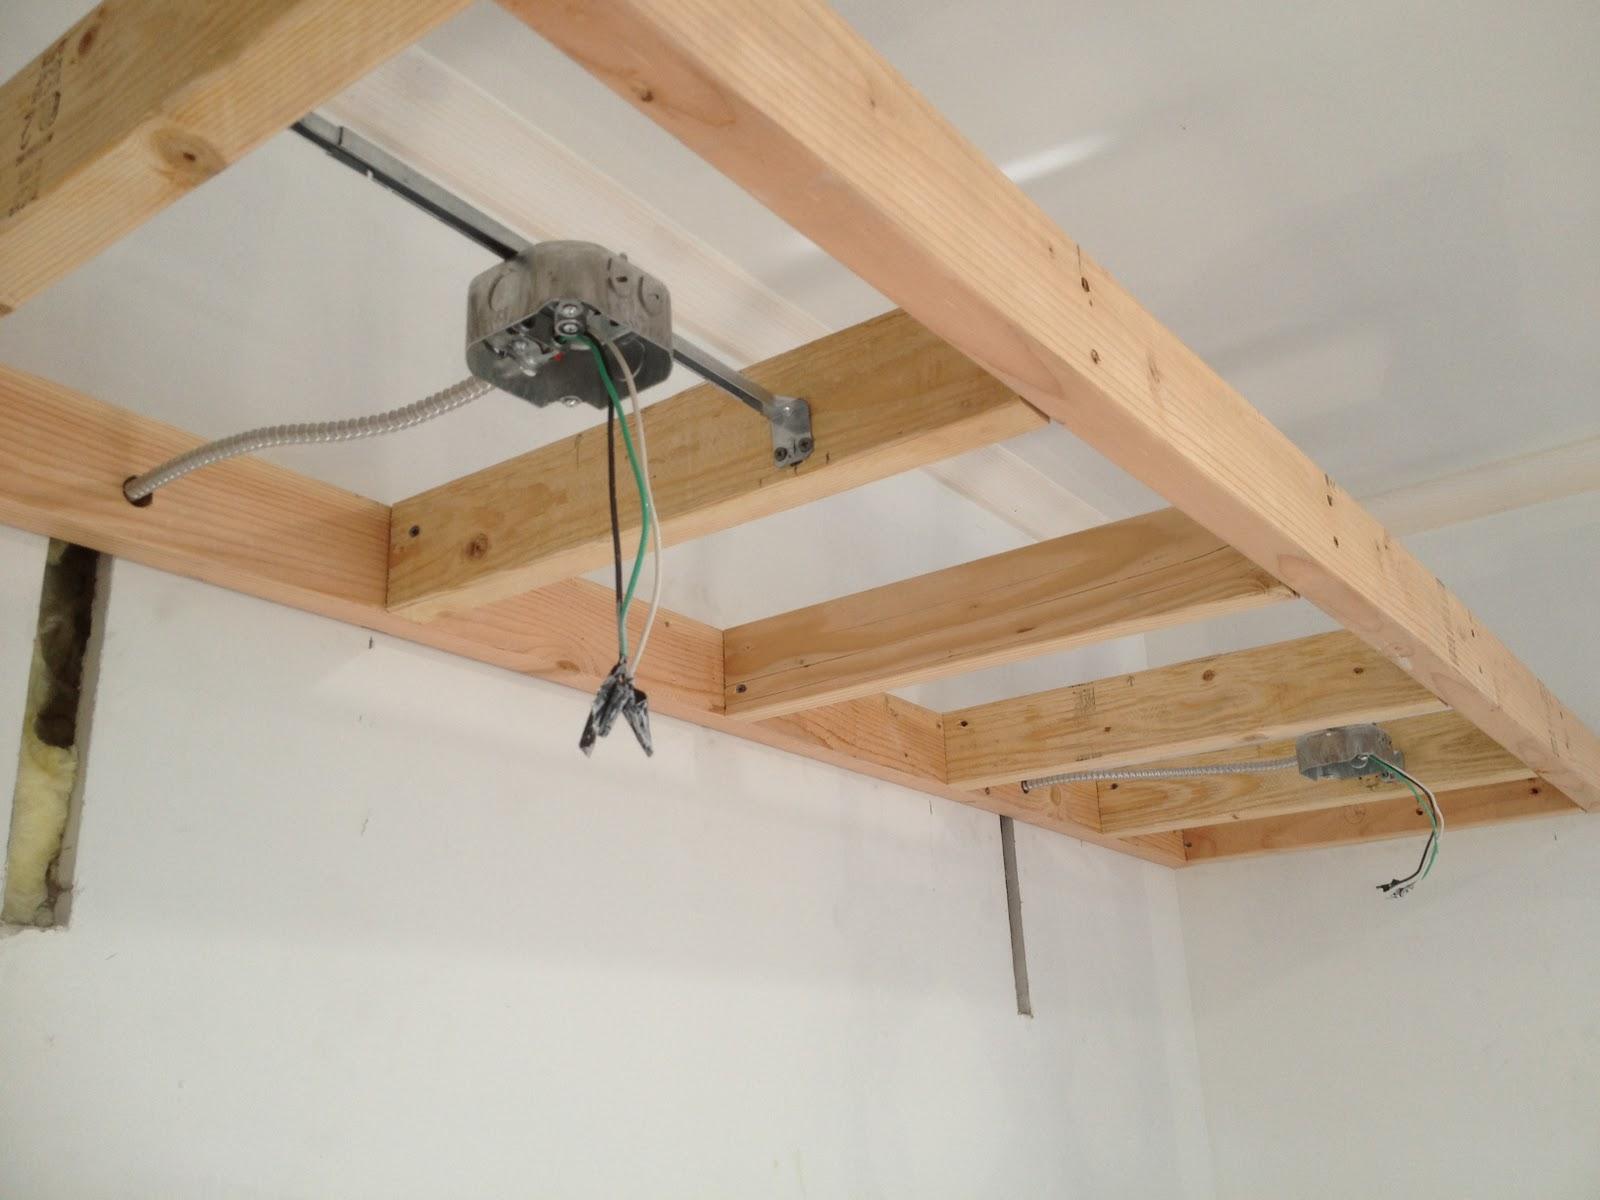 Metal Ceiling Fan Electrical Box Wiring Junction On